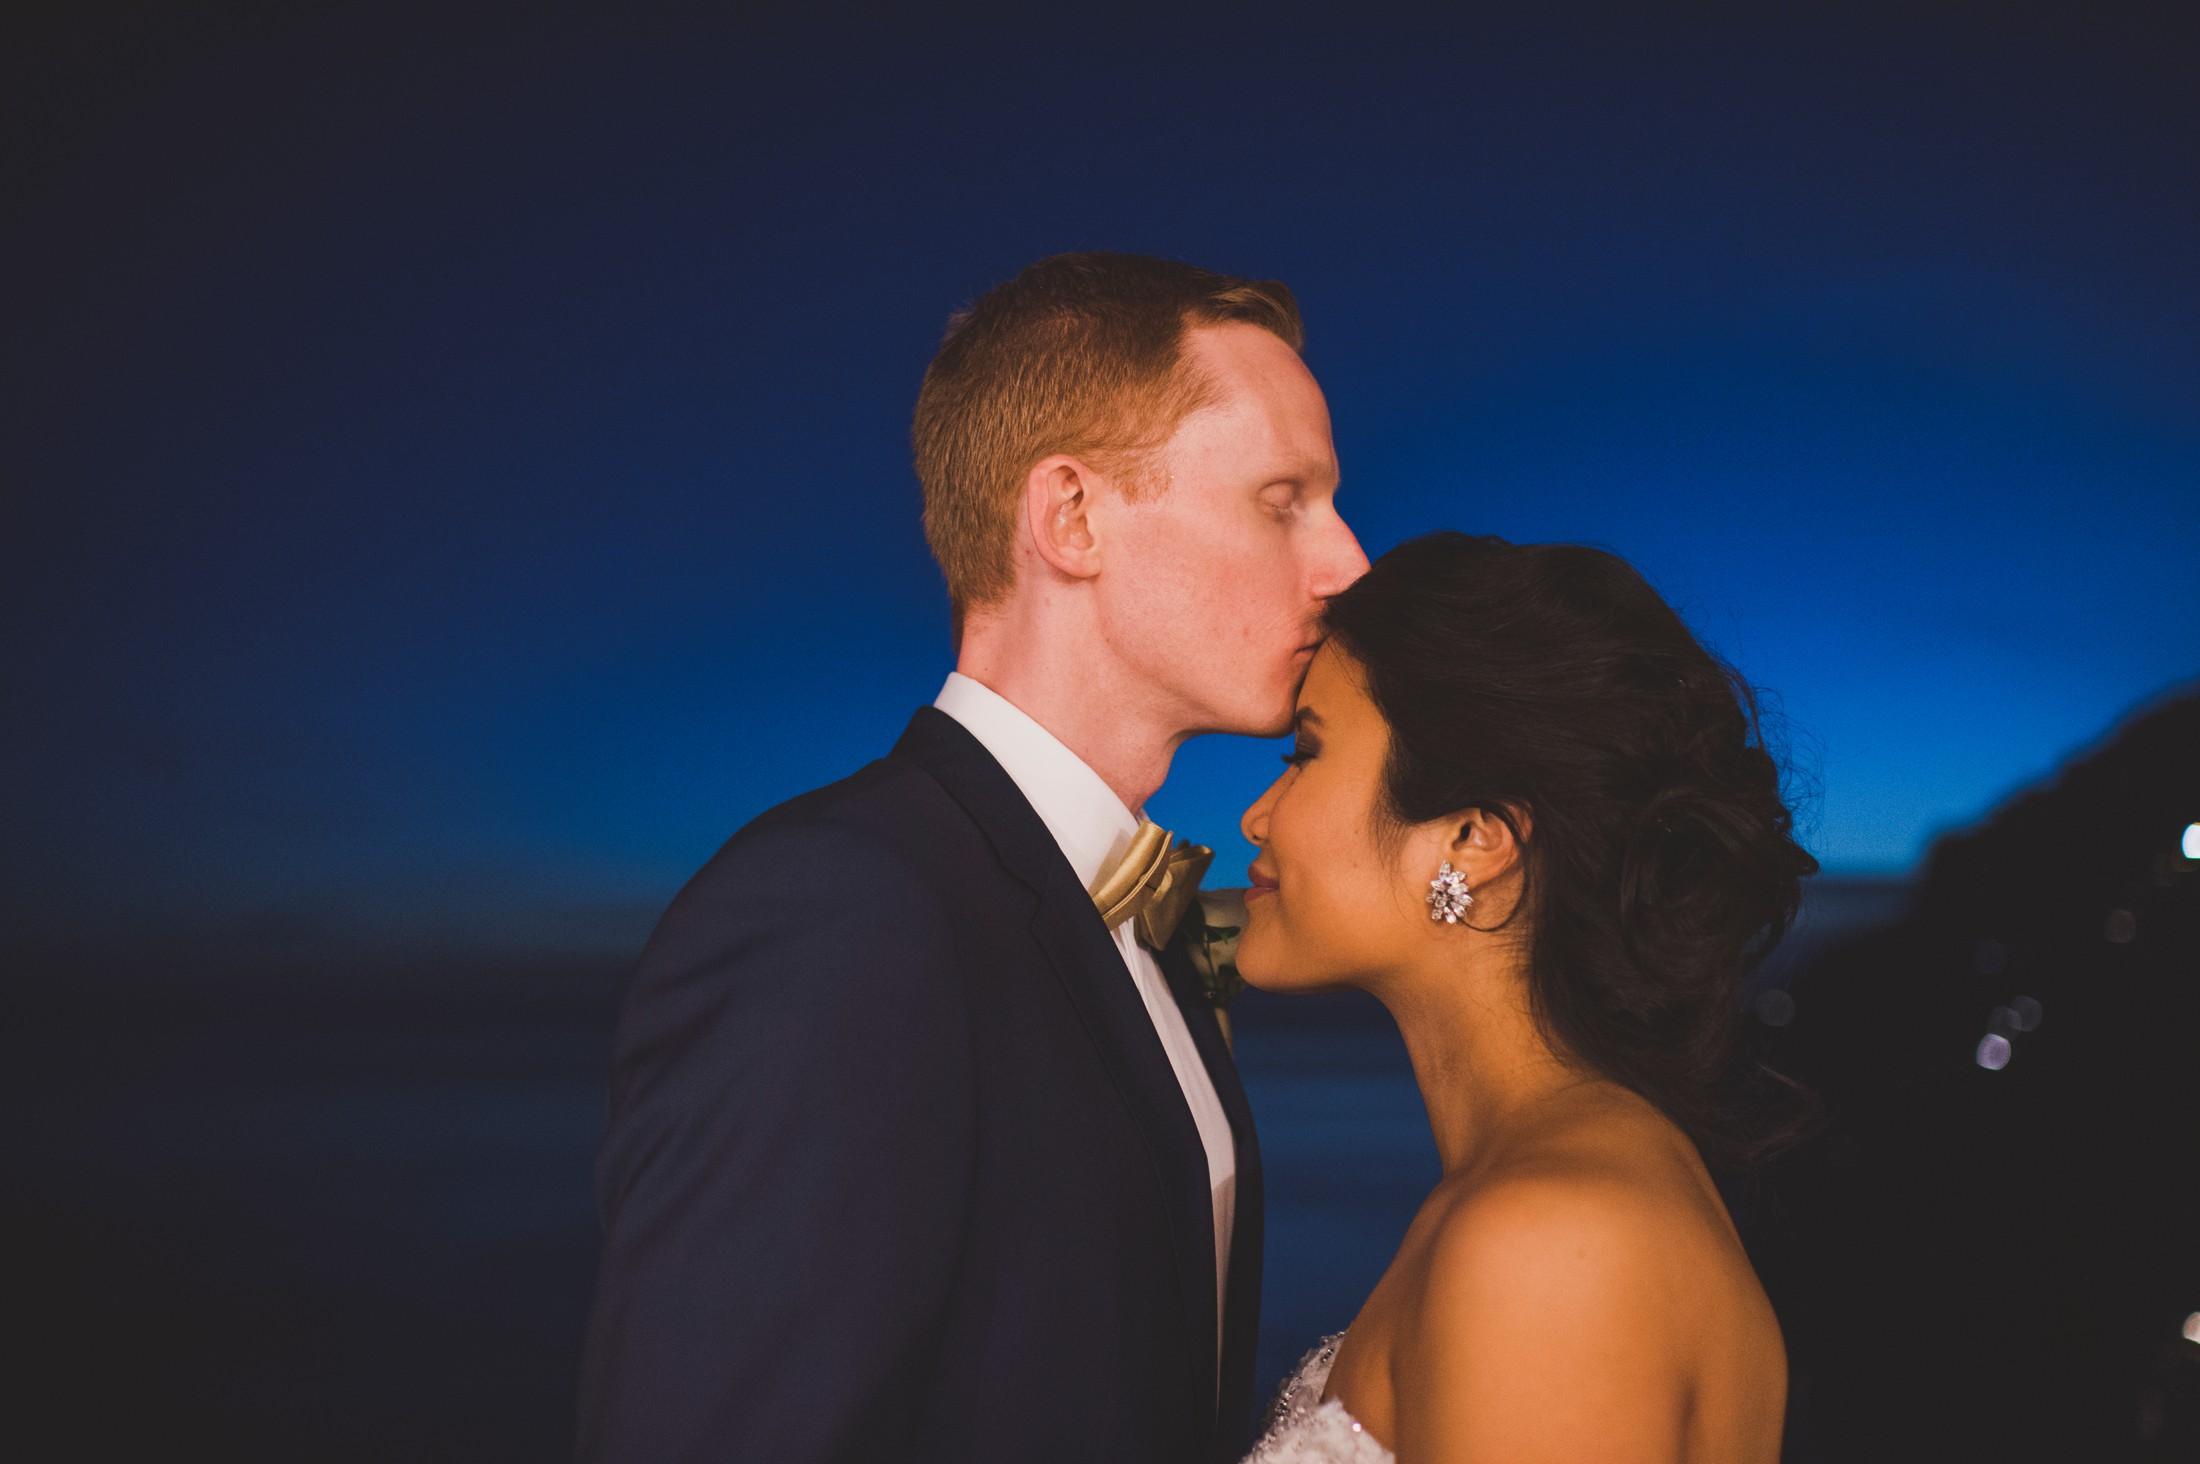 positano wedding the groom kissing the bride